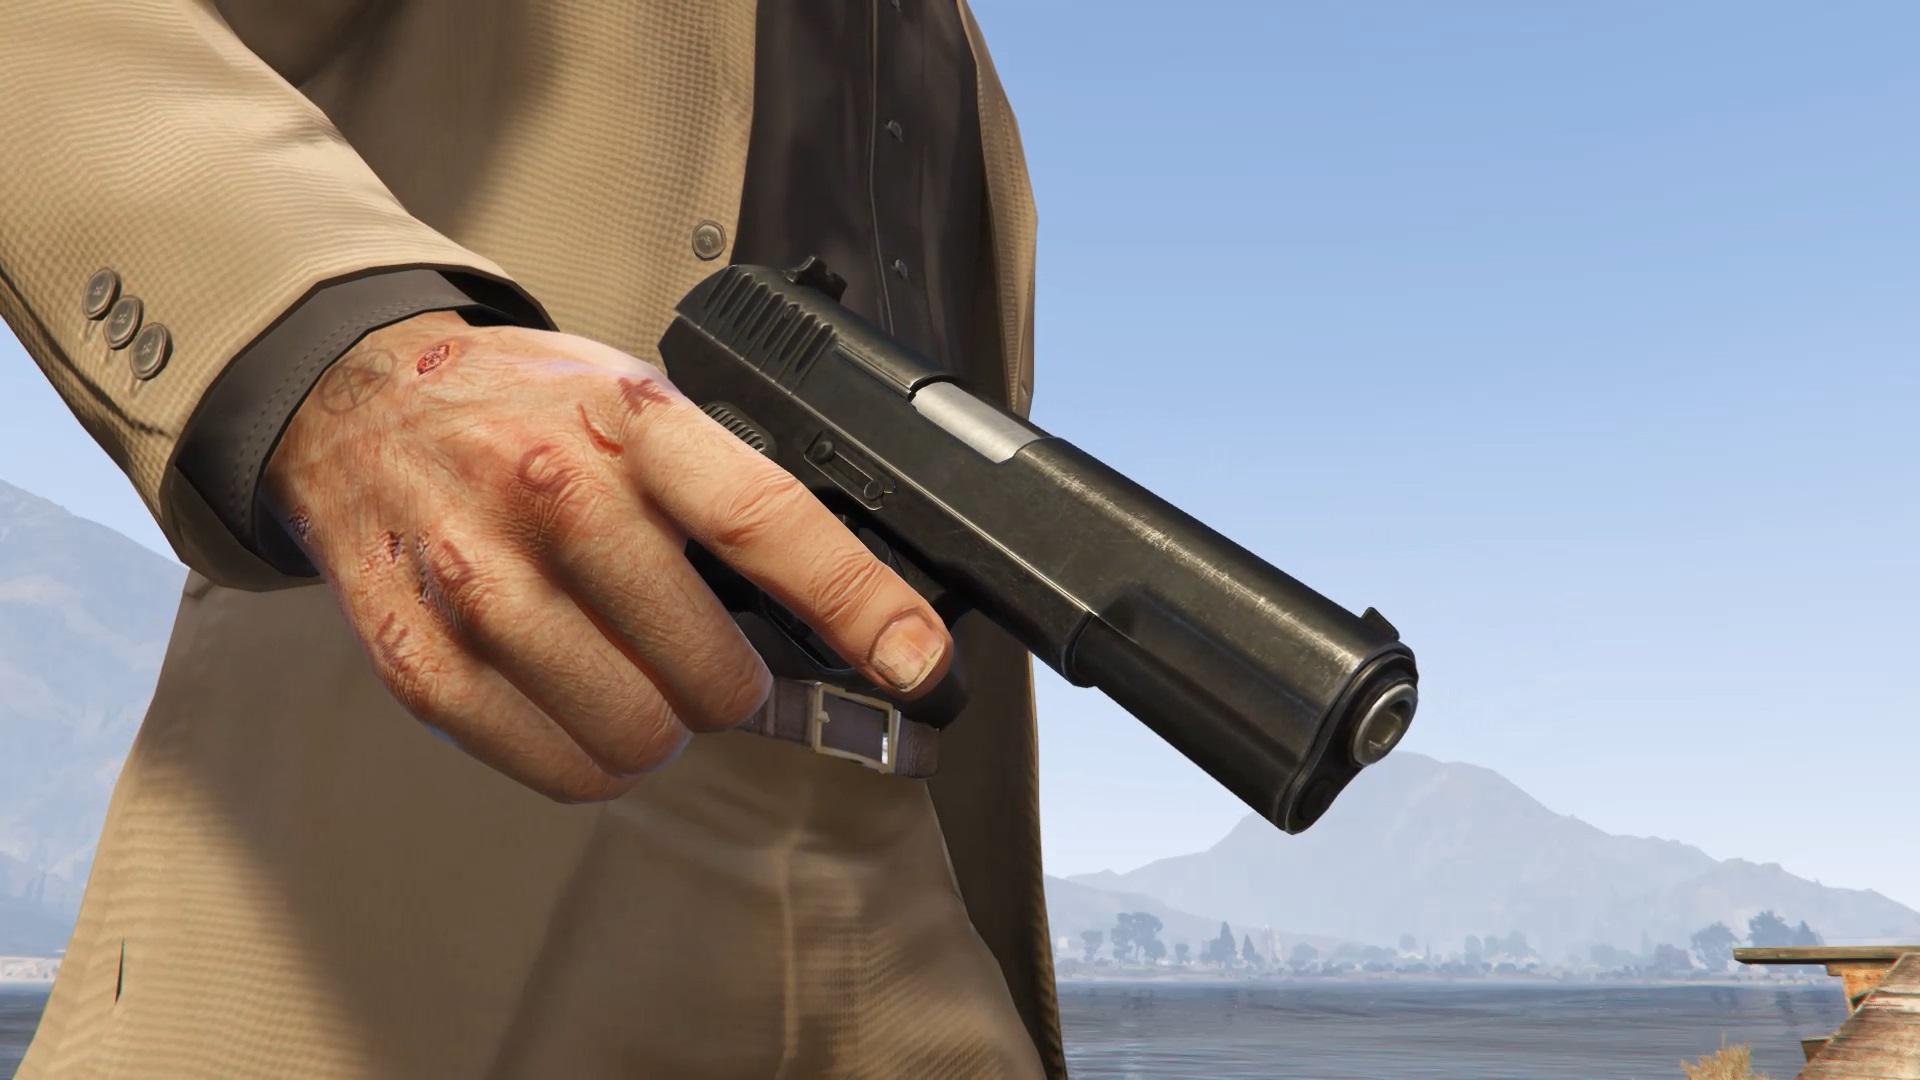 Tokarev Tt 33 Pistol 2k I Hp I Full Animated Gta5 Mods Com